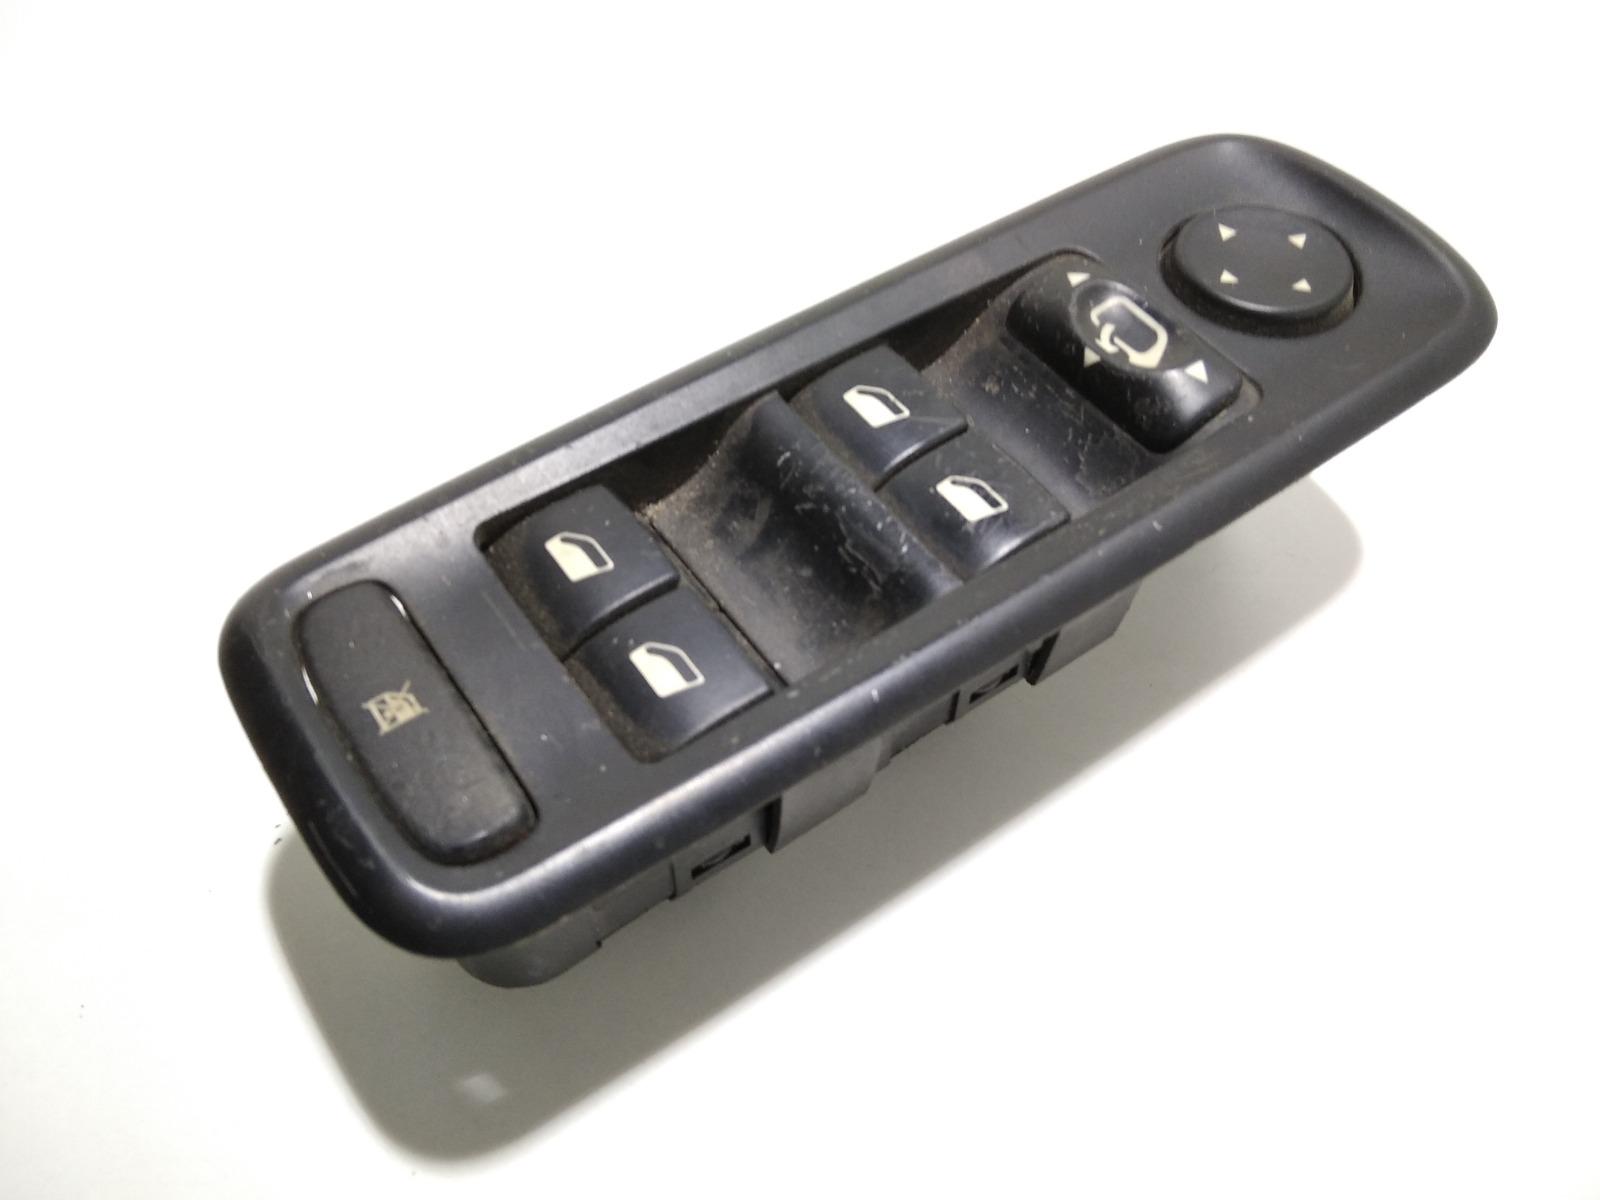 Кнопка стеклоподъемника Fiat Ulysse 2.0 I 2004 (б/у)